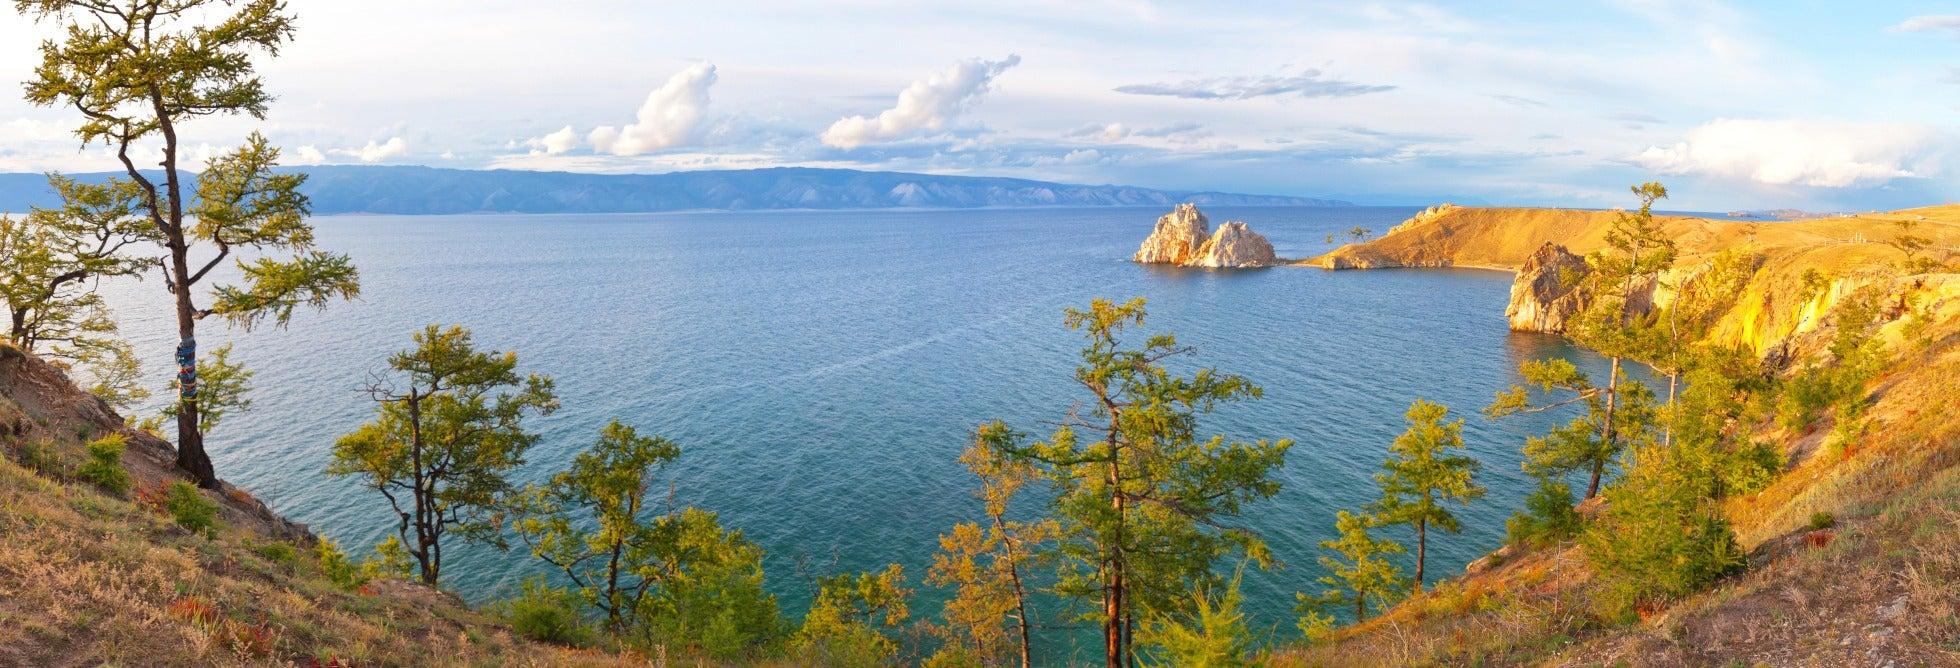 Crucero de 8 días por el lago Baikal